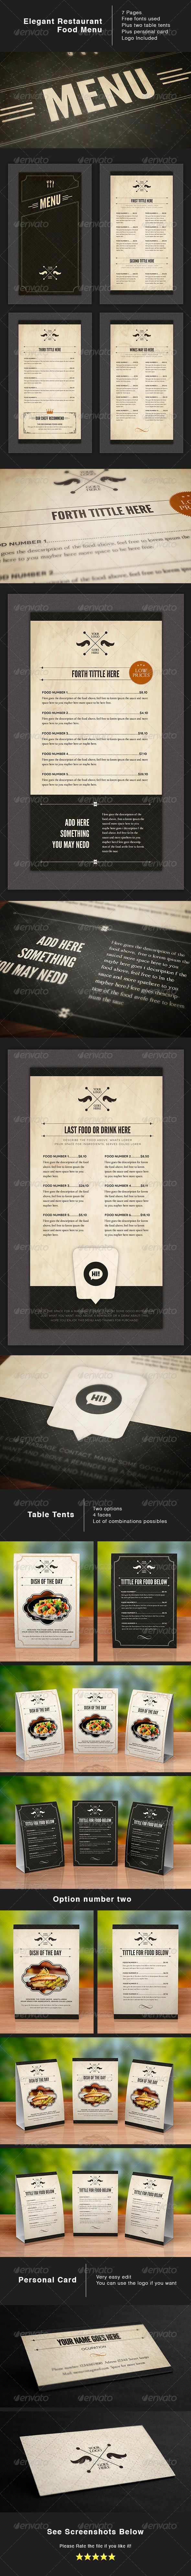 Design Food Stationery - Food Menus Print Templates